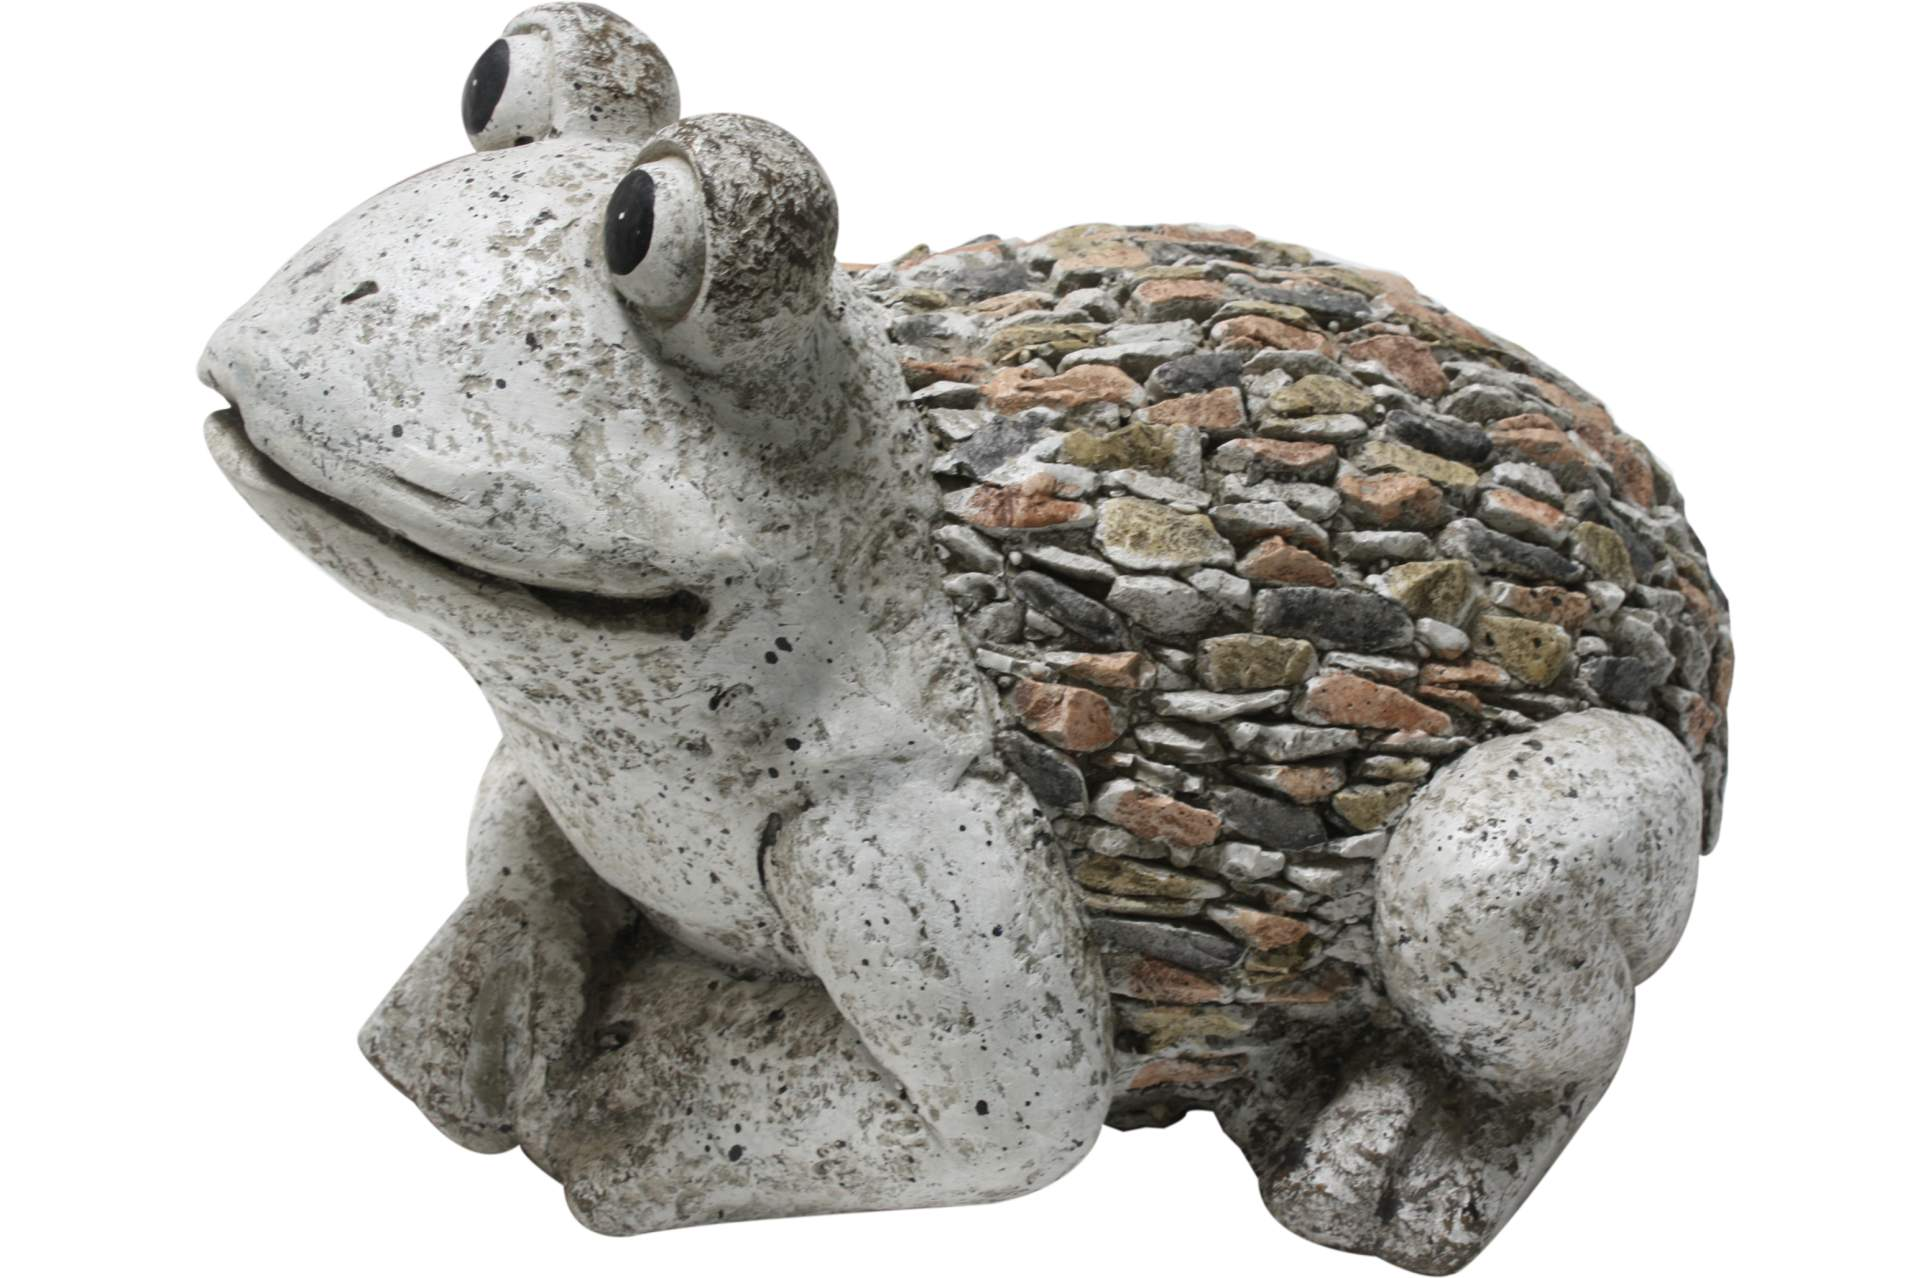 gartenfigur frosch 34 cm in steinoptik deko dekofigur beet skulptur dekoration ebay. Black Bedroom Furniture Sets. Home Design Ideas